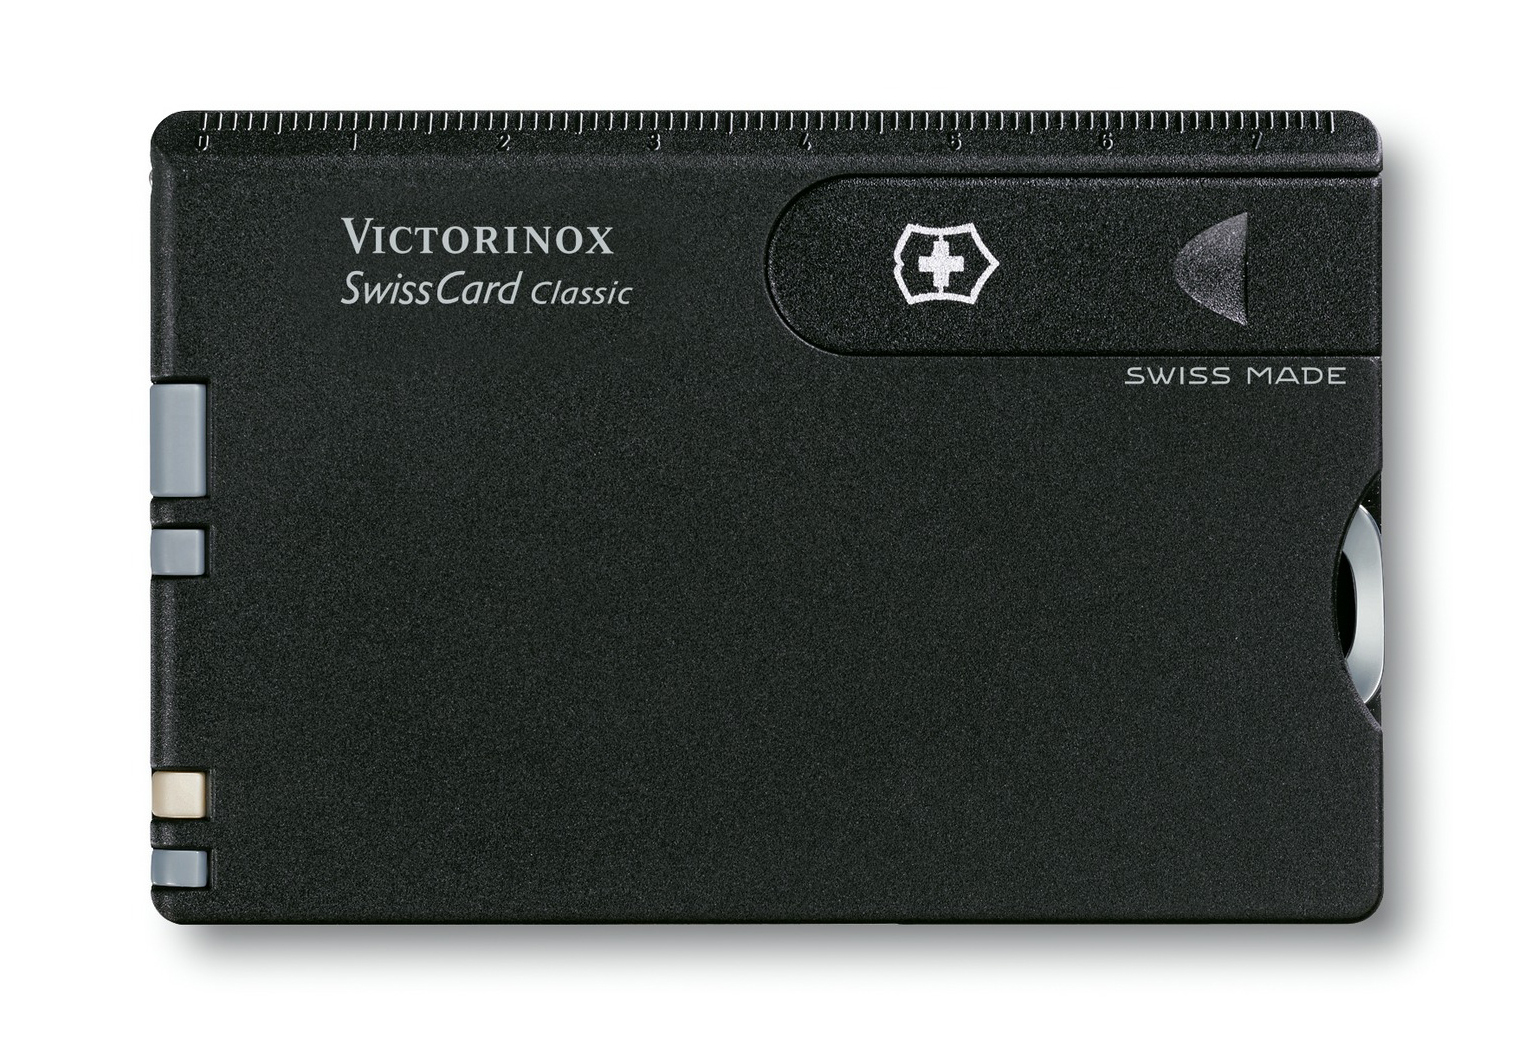 Швейцарская карта Victorinox SwissCard Classic Black (0.7133) - Wenger-Victorinox.Ru